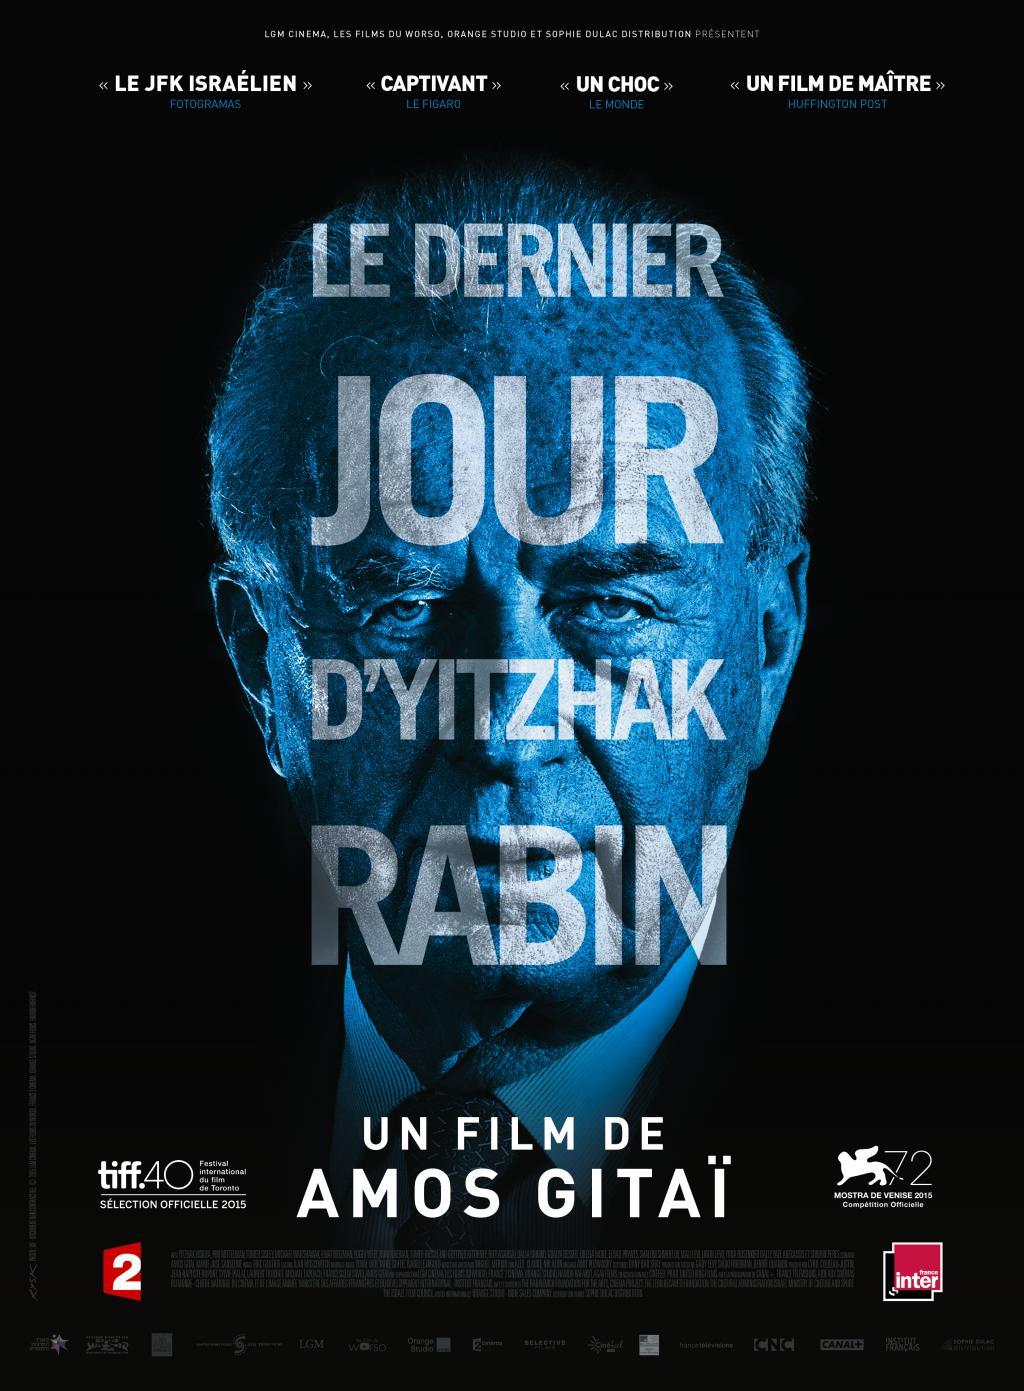 Film: Le dernier jour d'Yitzhak Rabin, d'Amos Gitaï